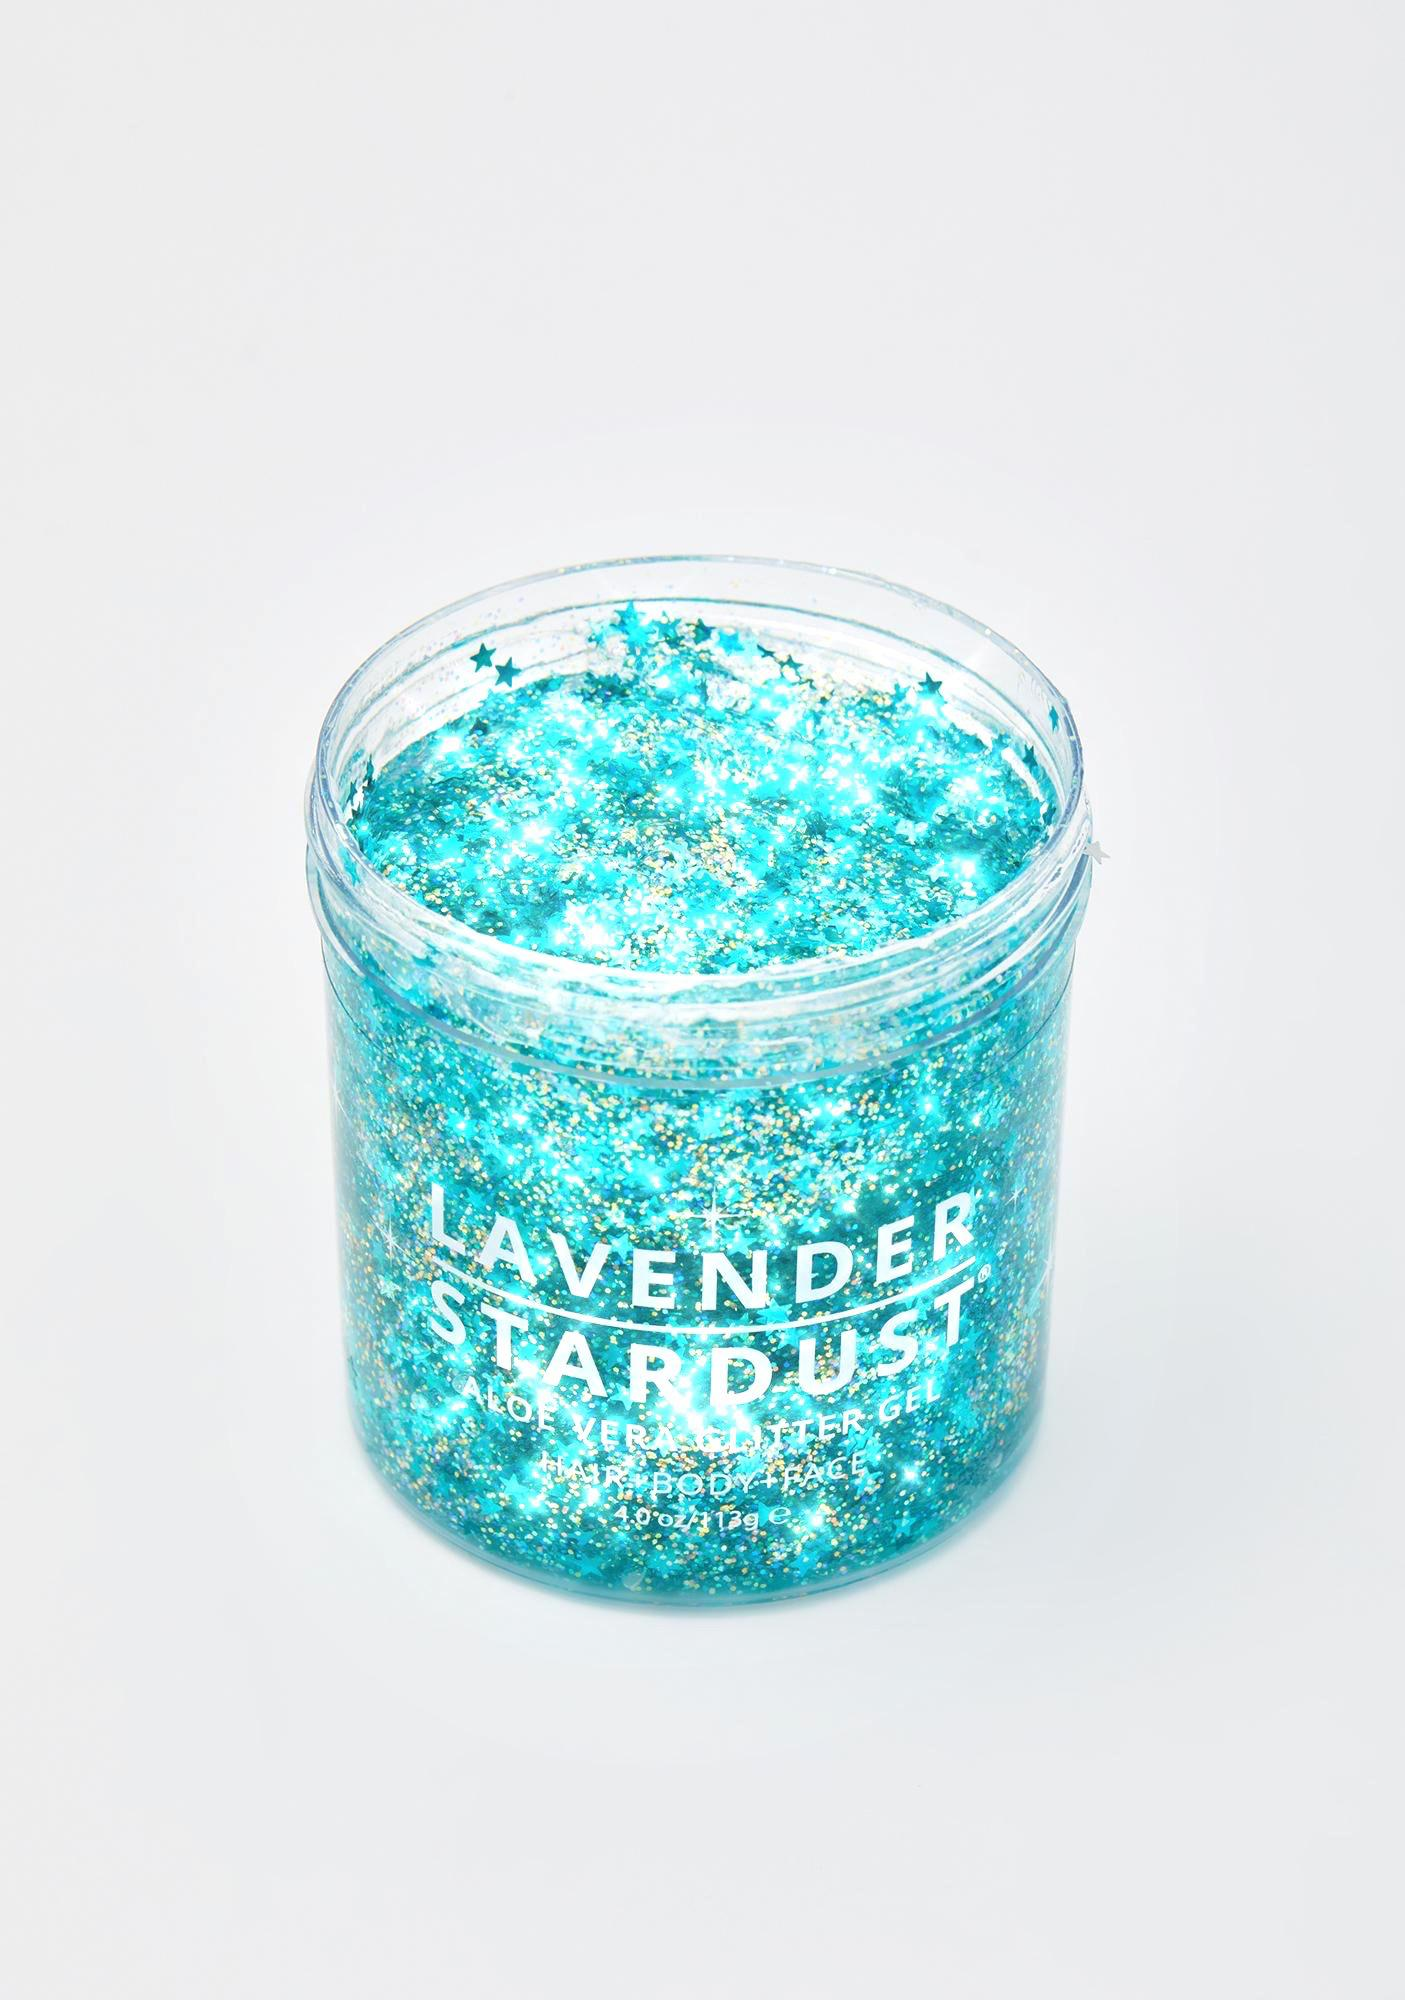 Lavender Stardust Mermaid Aloe Vera Glitter Gel